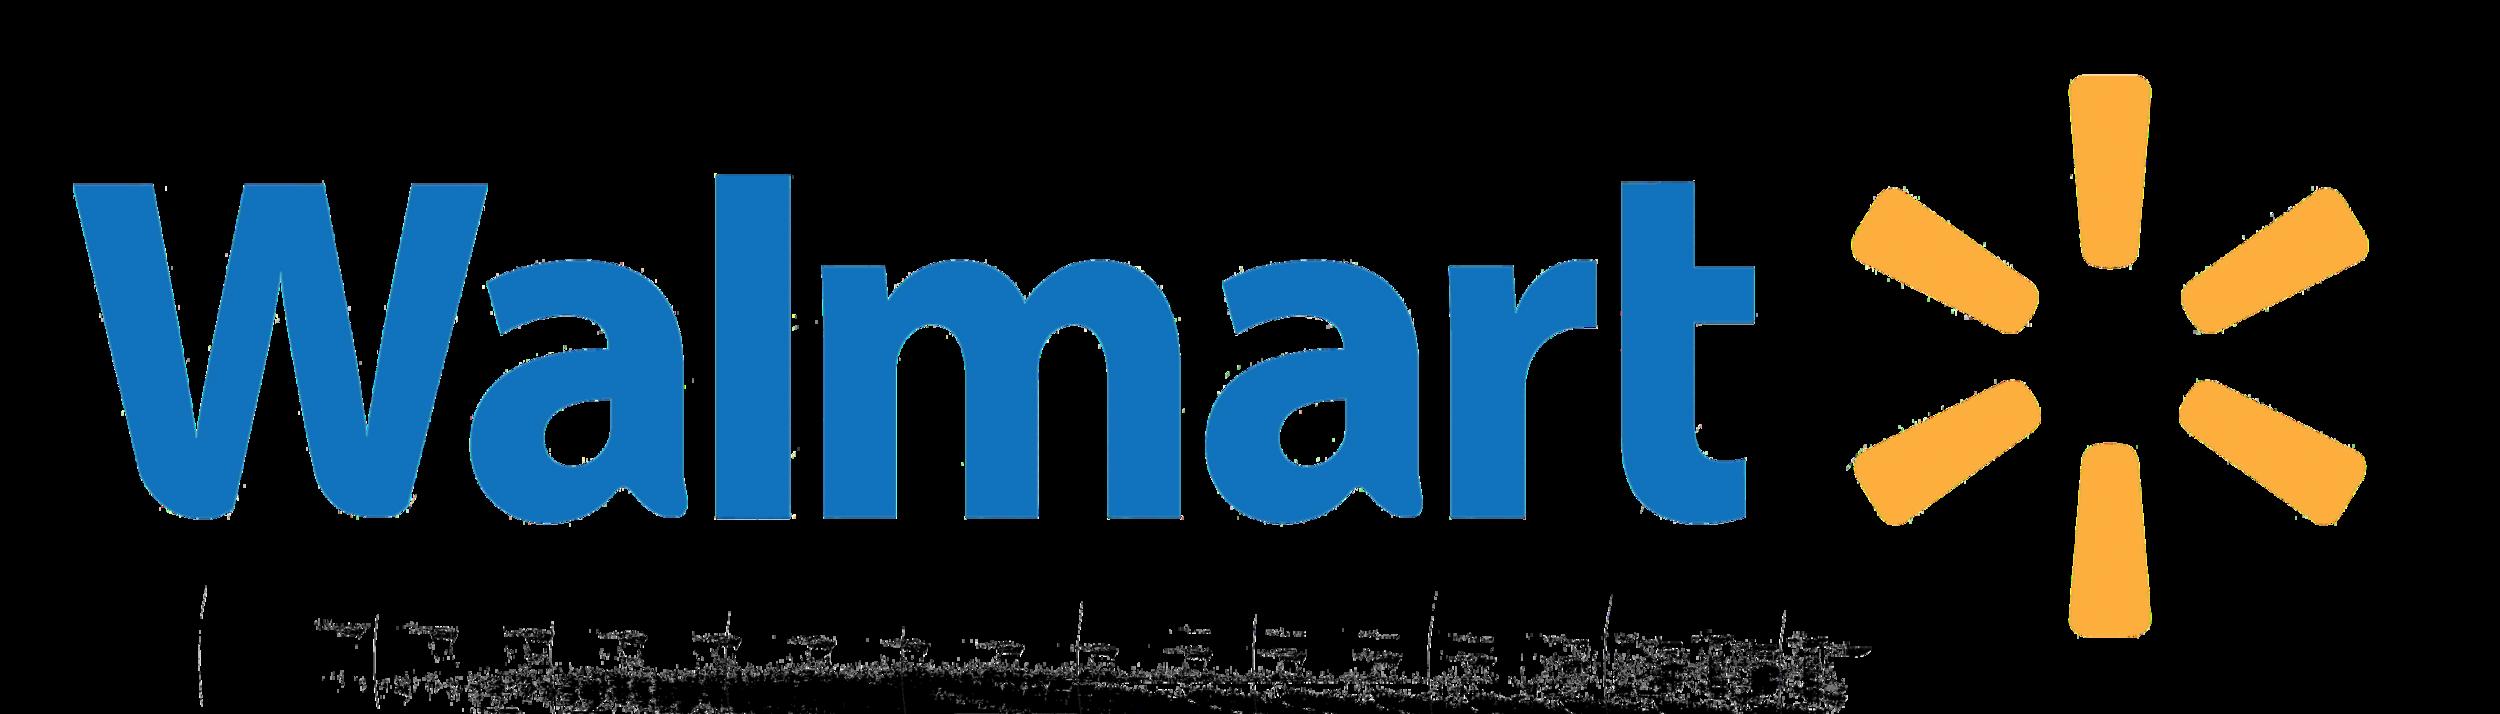 Walmart-Logo-PNG-Transparent (1).png